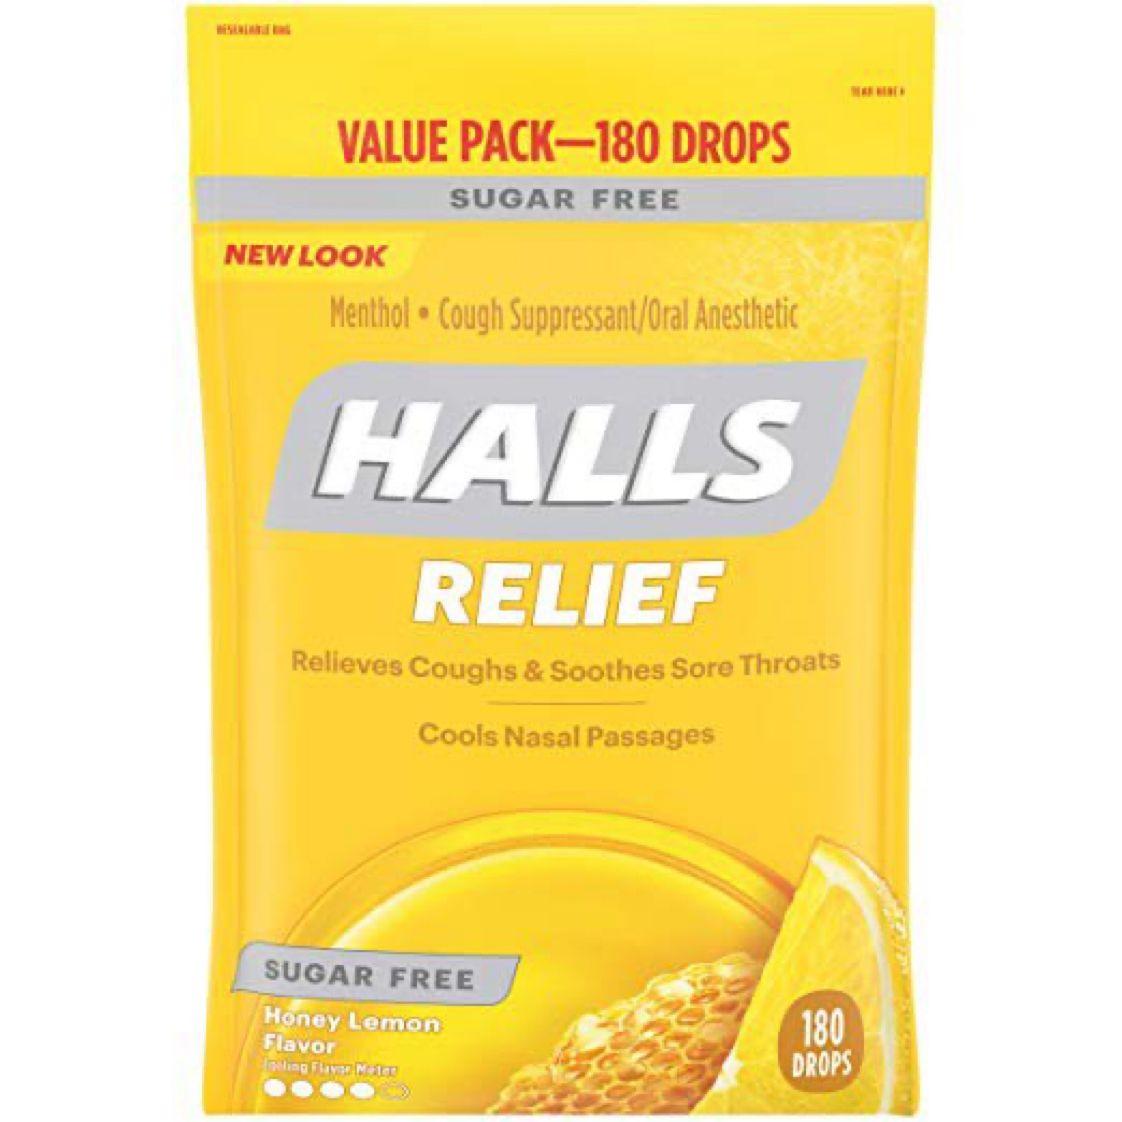 Halls Sugar Free Cough Suppressant, Honey-Lemon, 180-Drop Bag   $6.53 with Free Prime Shipping   #steals #deals #stealsanddeals